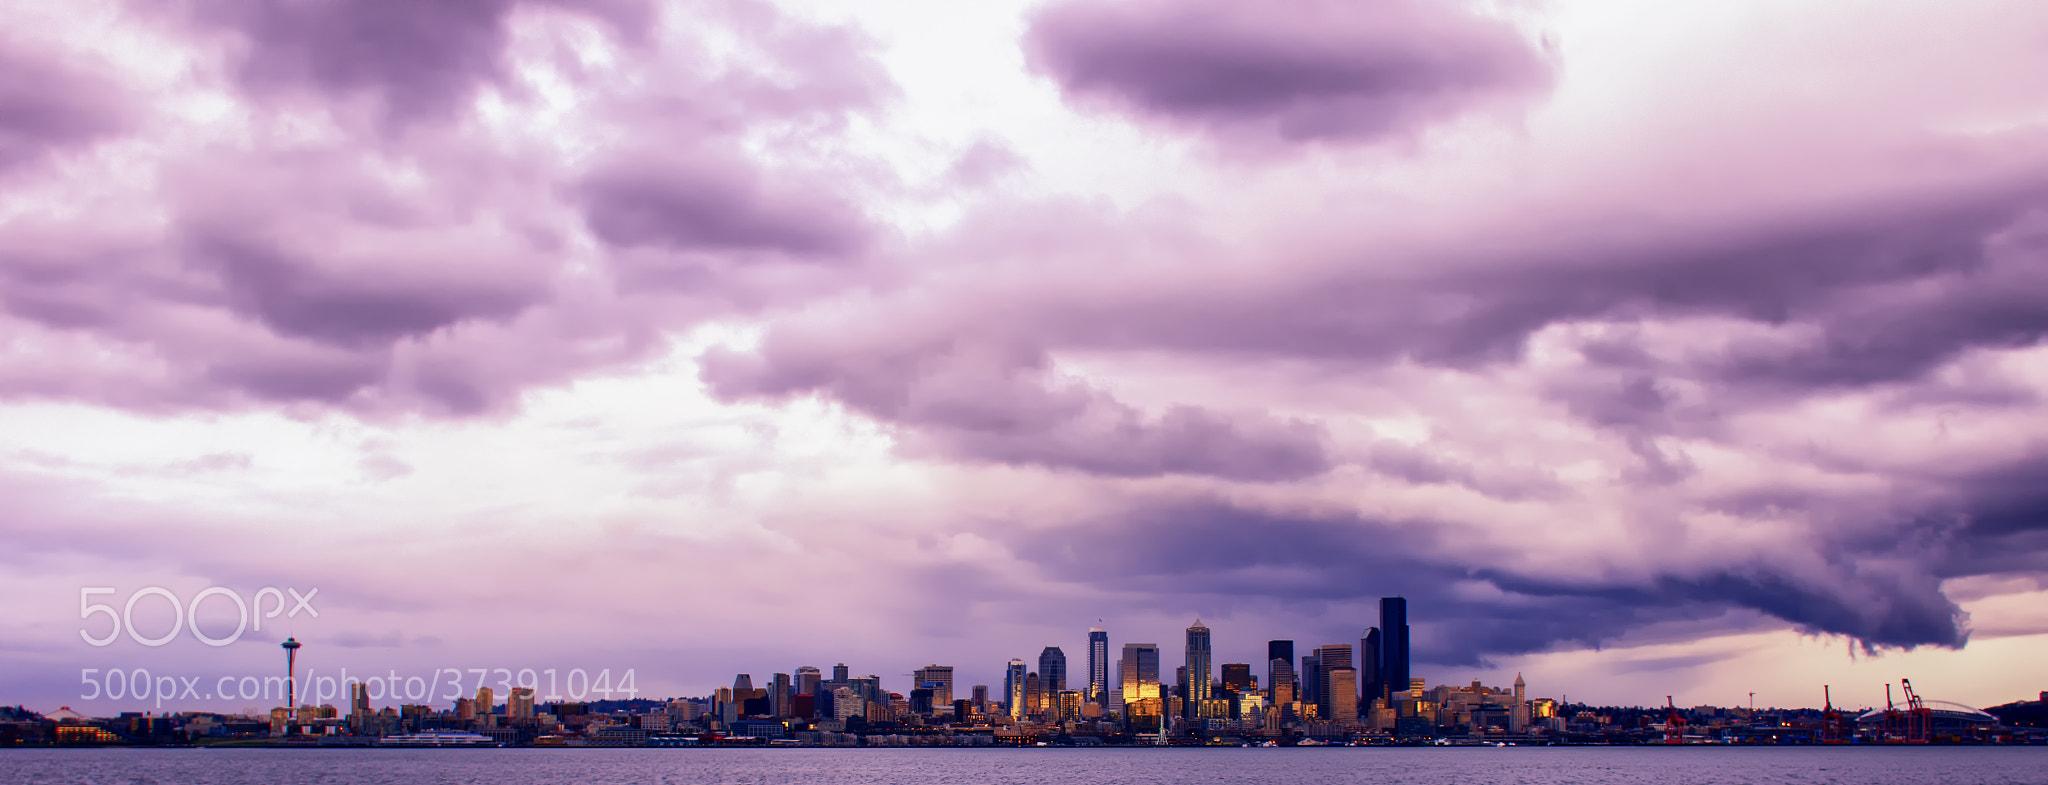 Photograph Storm Rolls Through by Dan Goldberger on 500px